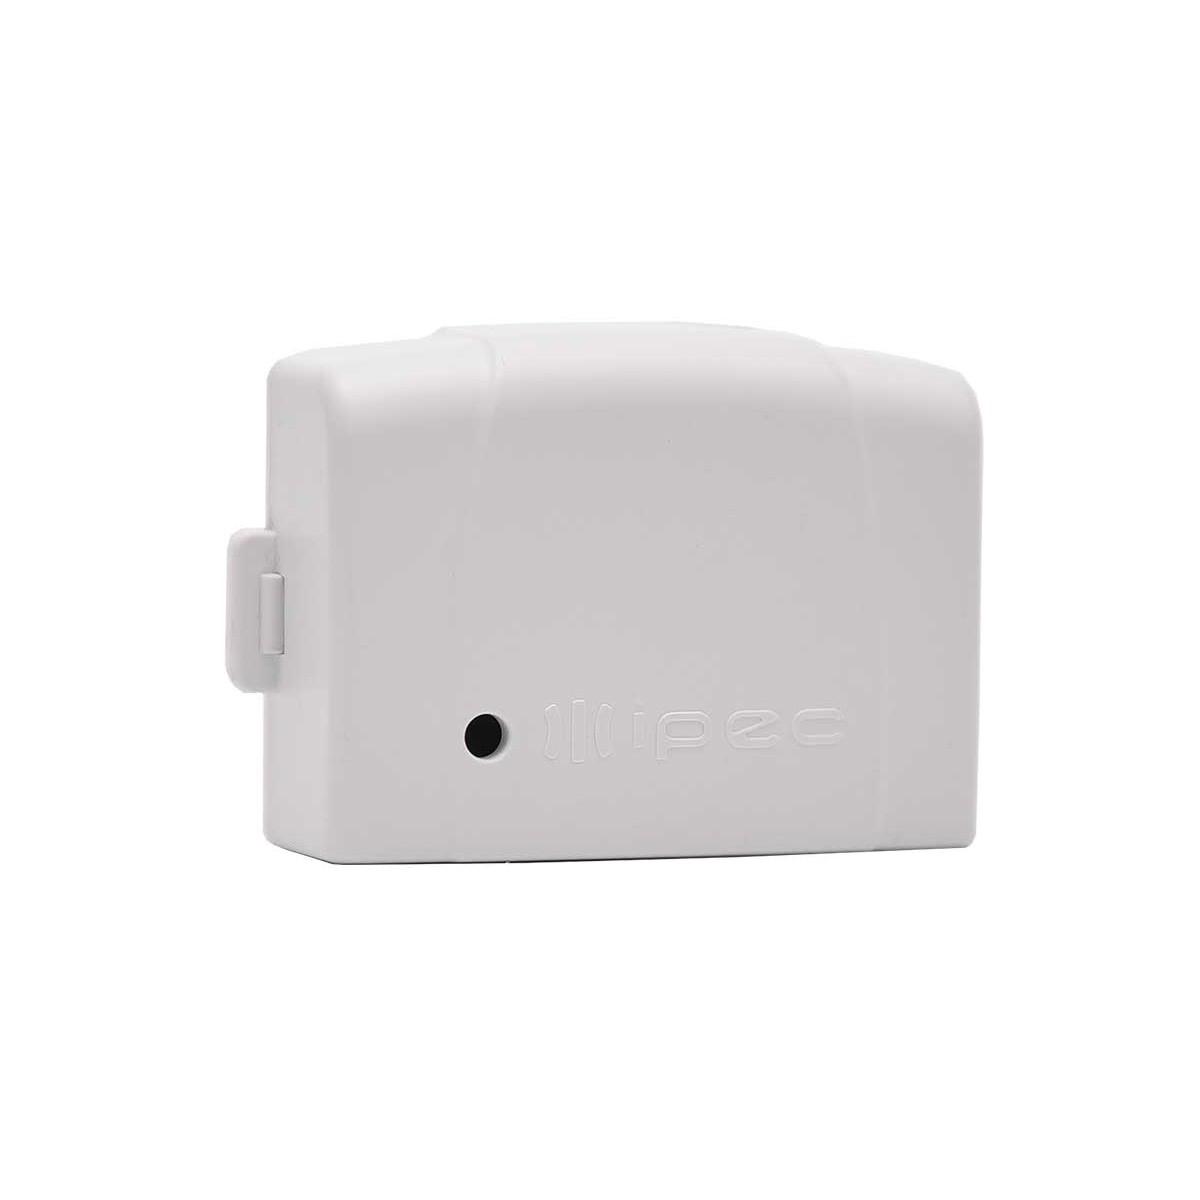 Sensor Magnético Sem Fio Alarme Residencial Portas Janelas Saw 433,92mhz Ipec